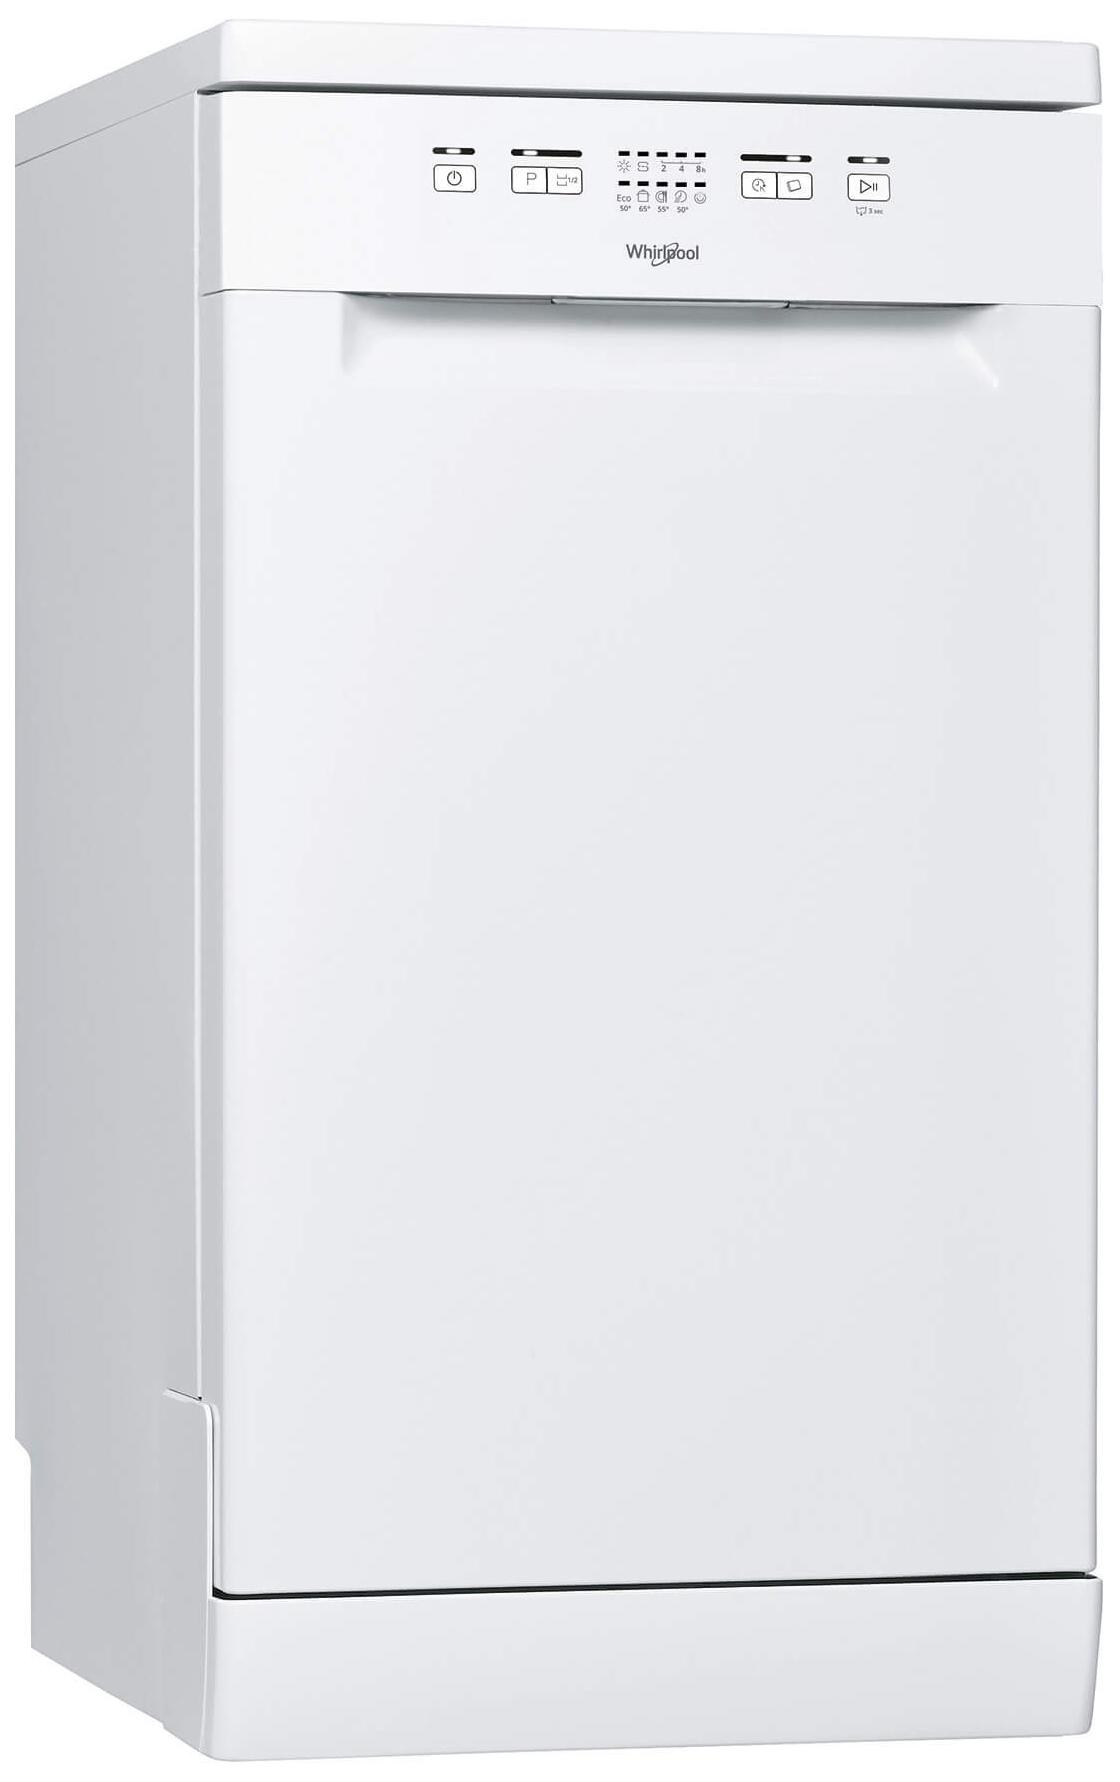 Посудомоечная машина 45 см Whirlpool WSFE 2B19